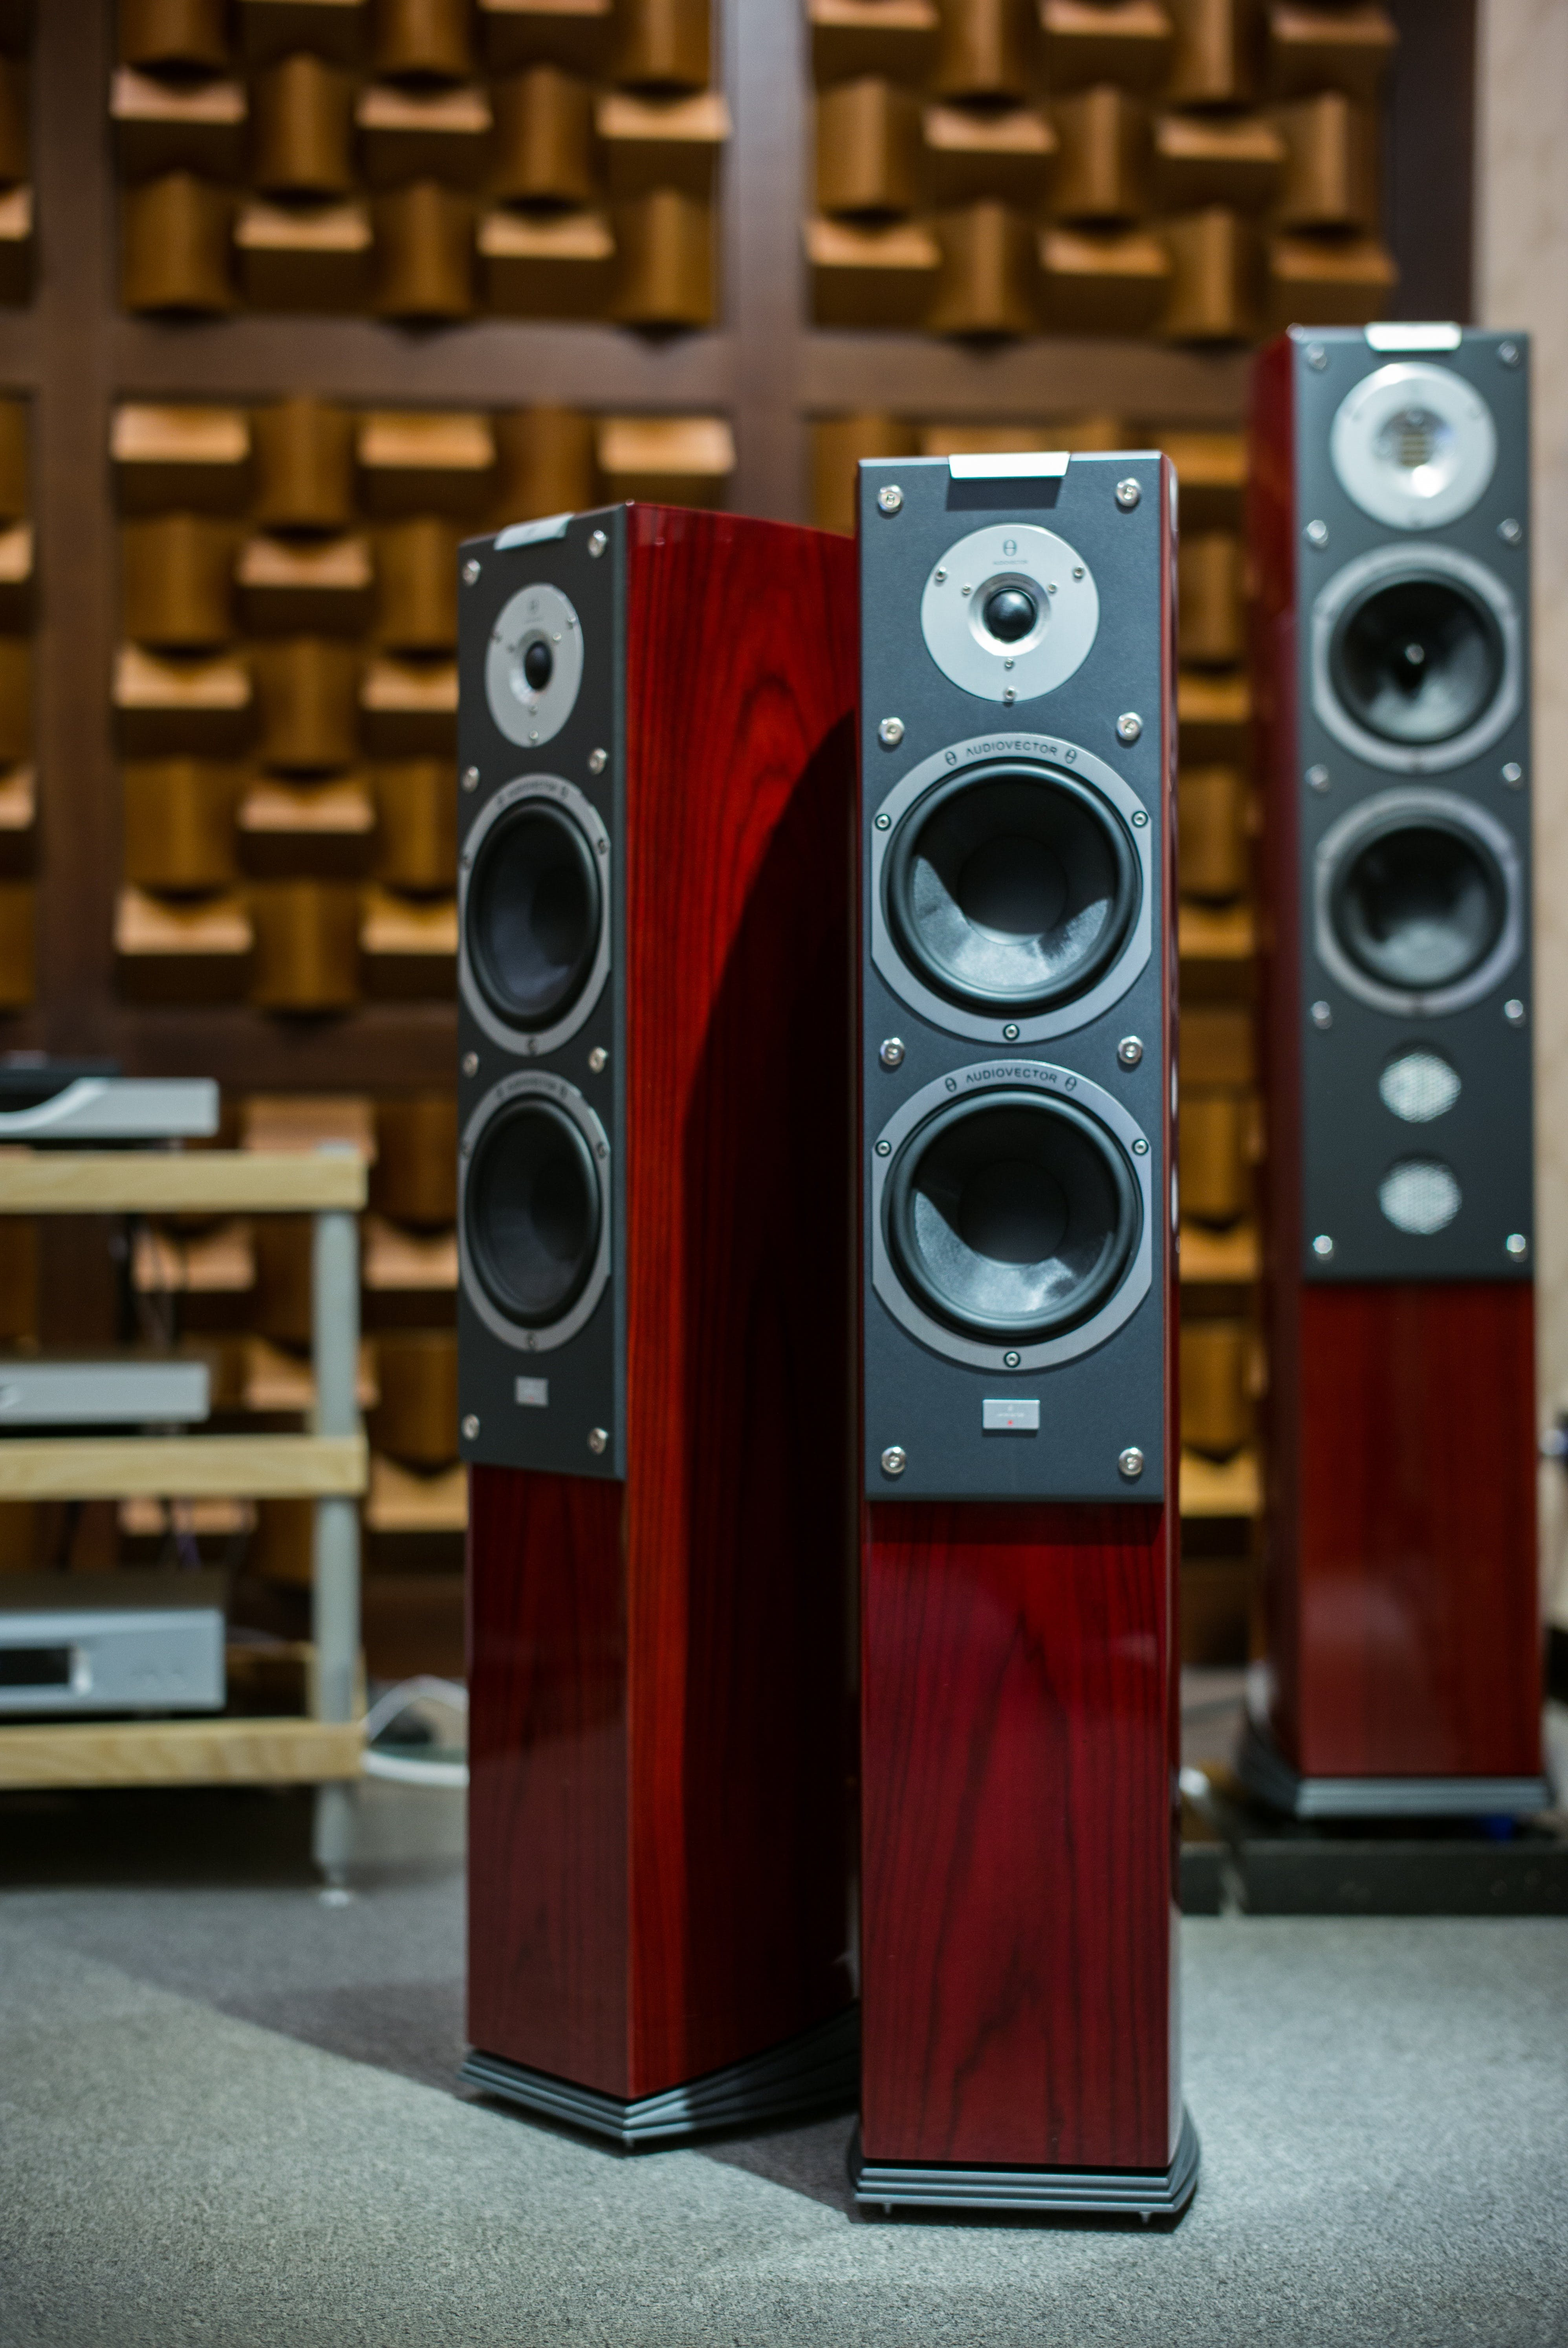 Three Red Tower Speakers